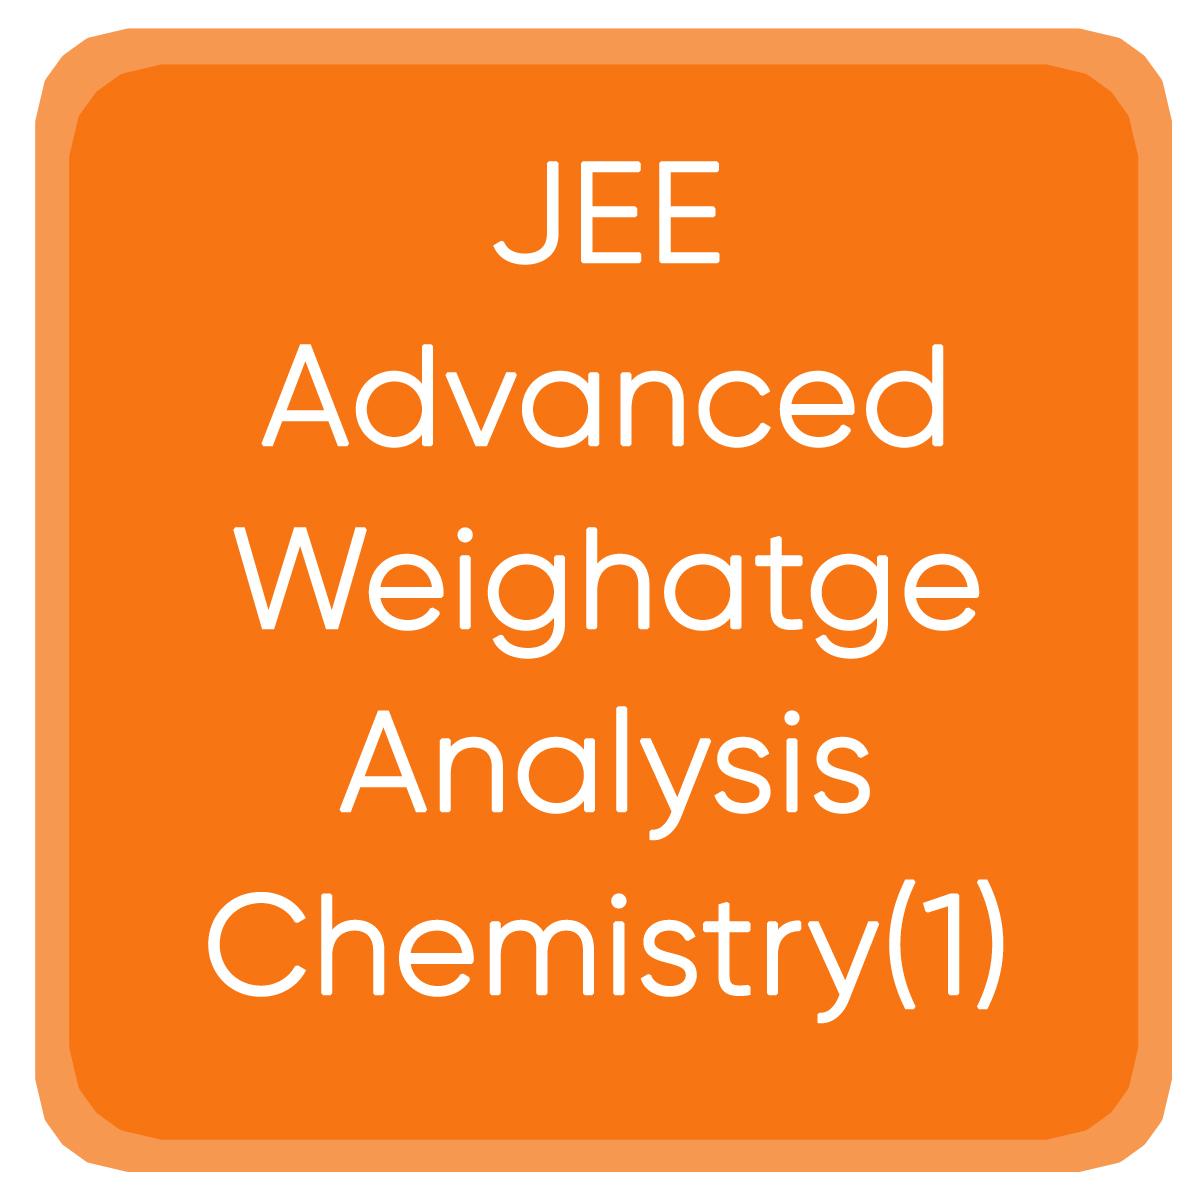 JEE Advanced Weighatge Analysis Chemistry(1)